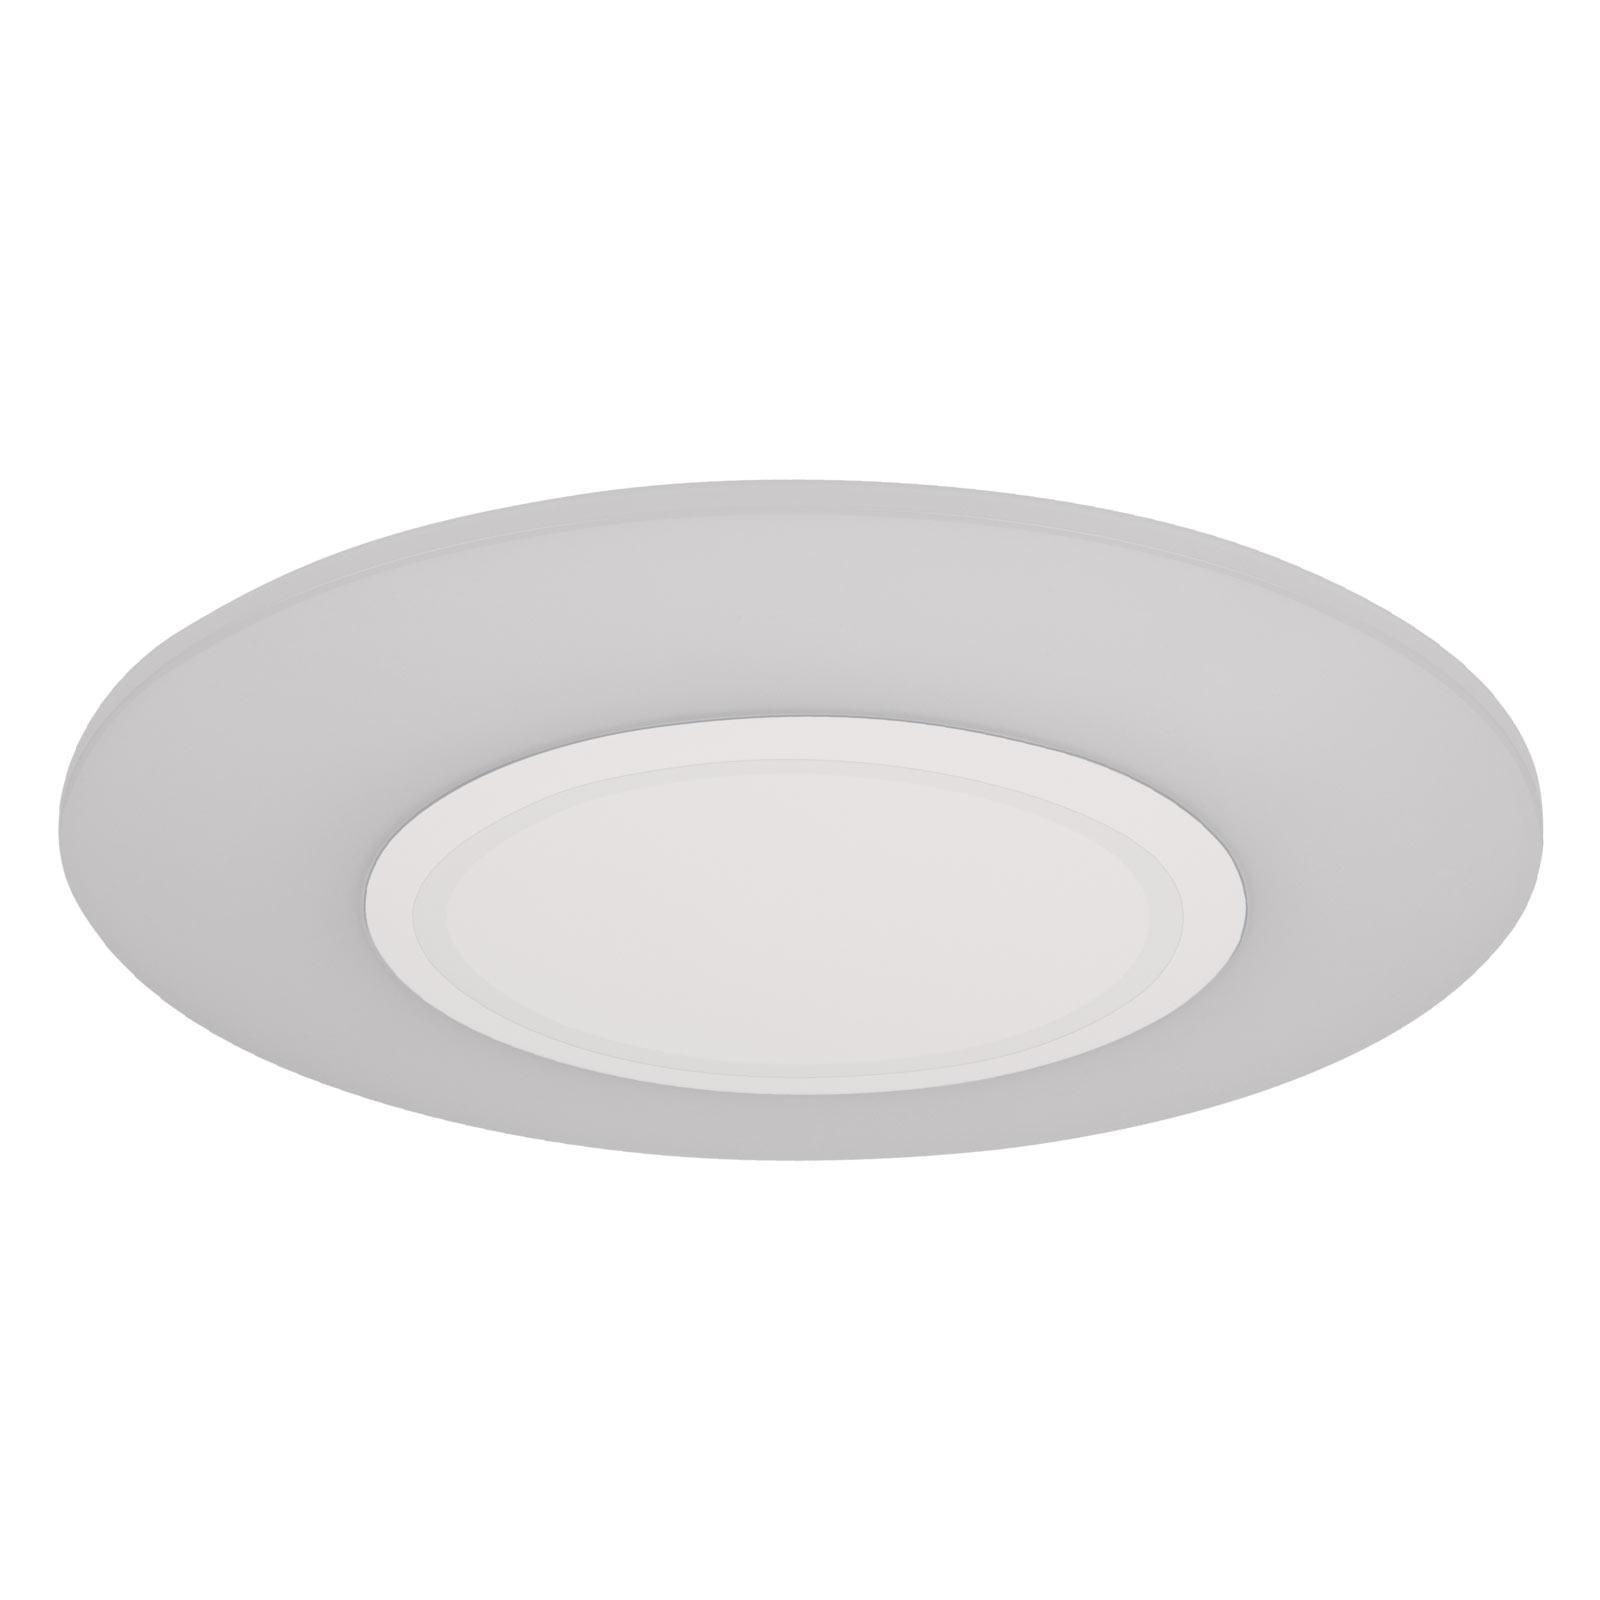 Deckenlampe Flach Lang